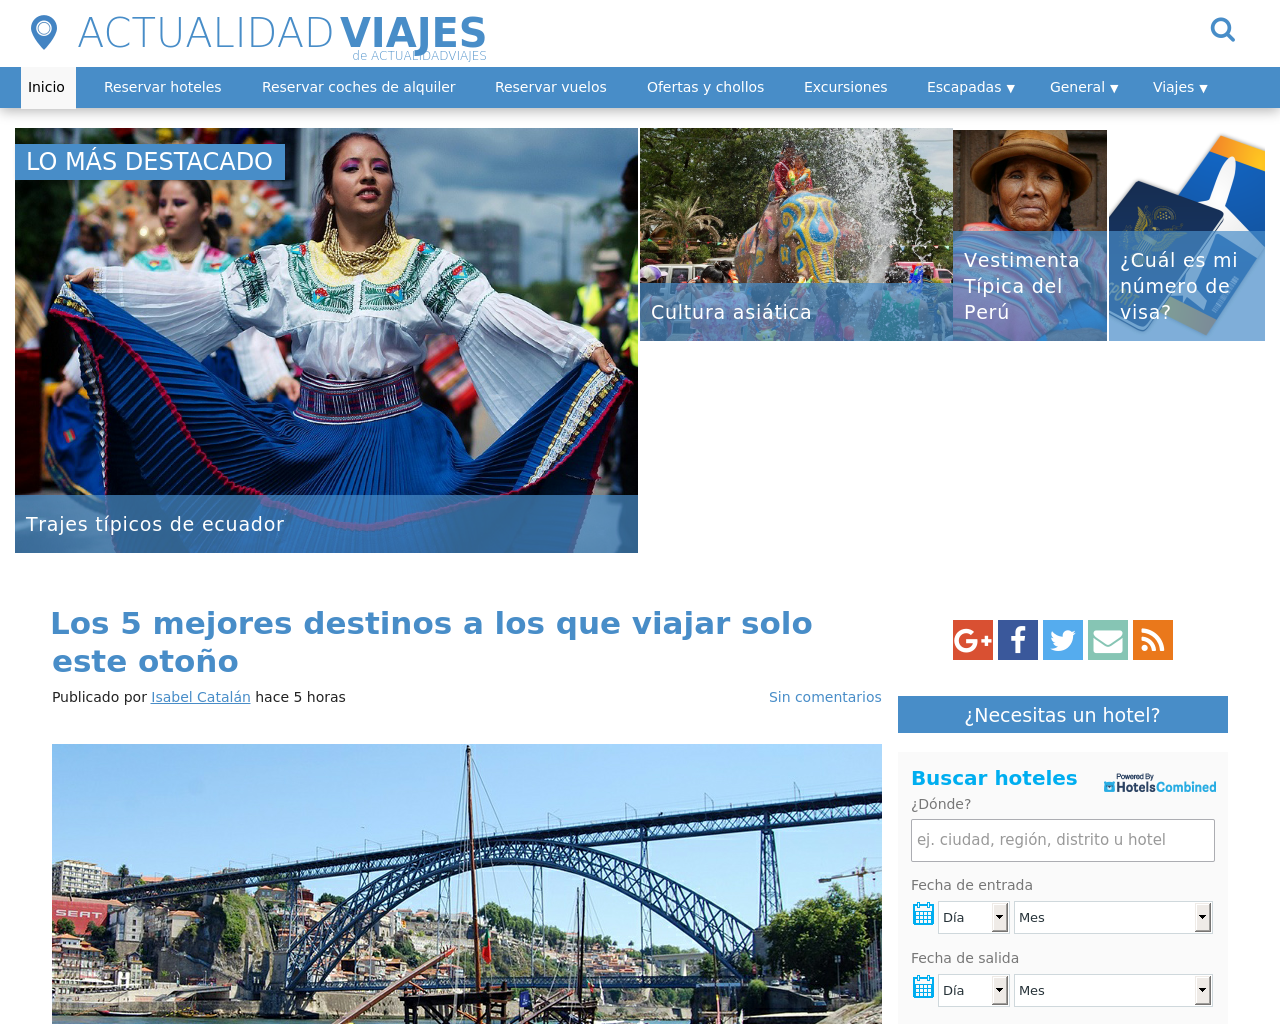 Actualidad-Viajes-Advertising-Reviews-Pricing